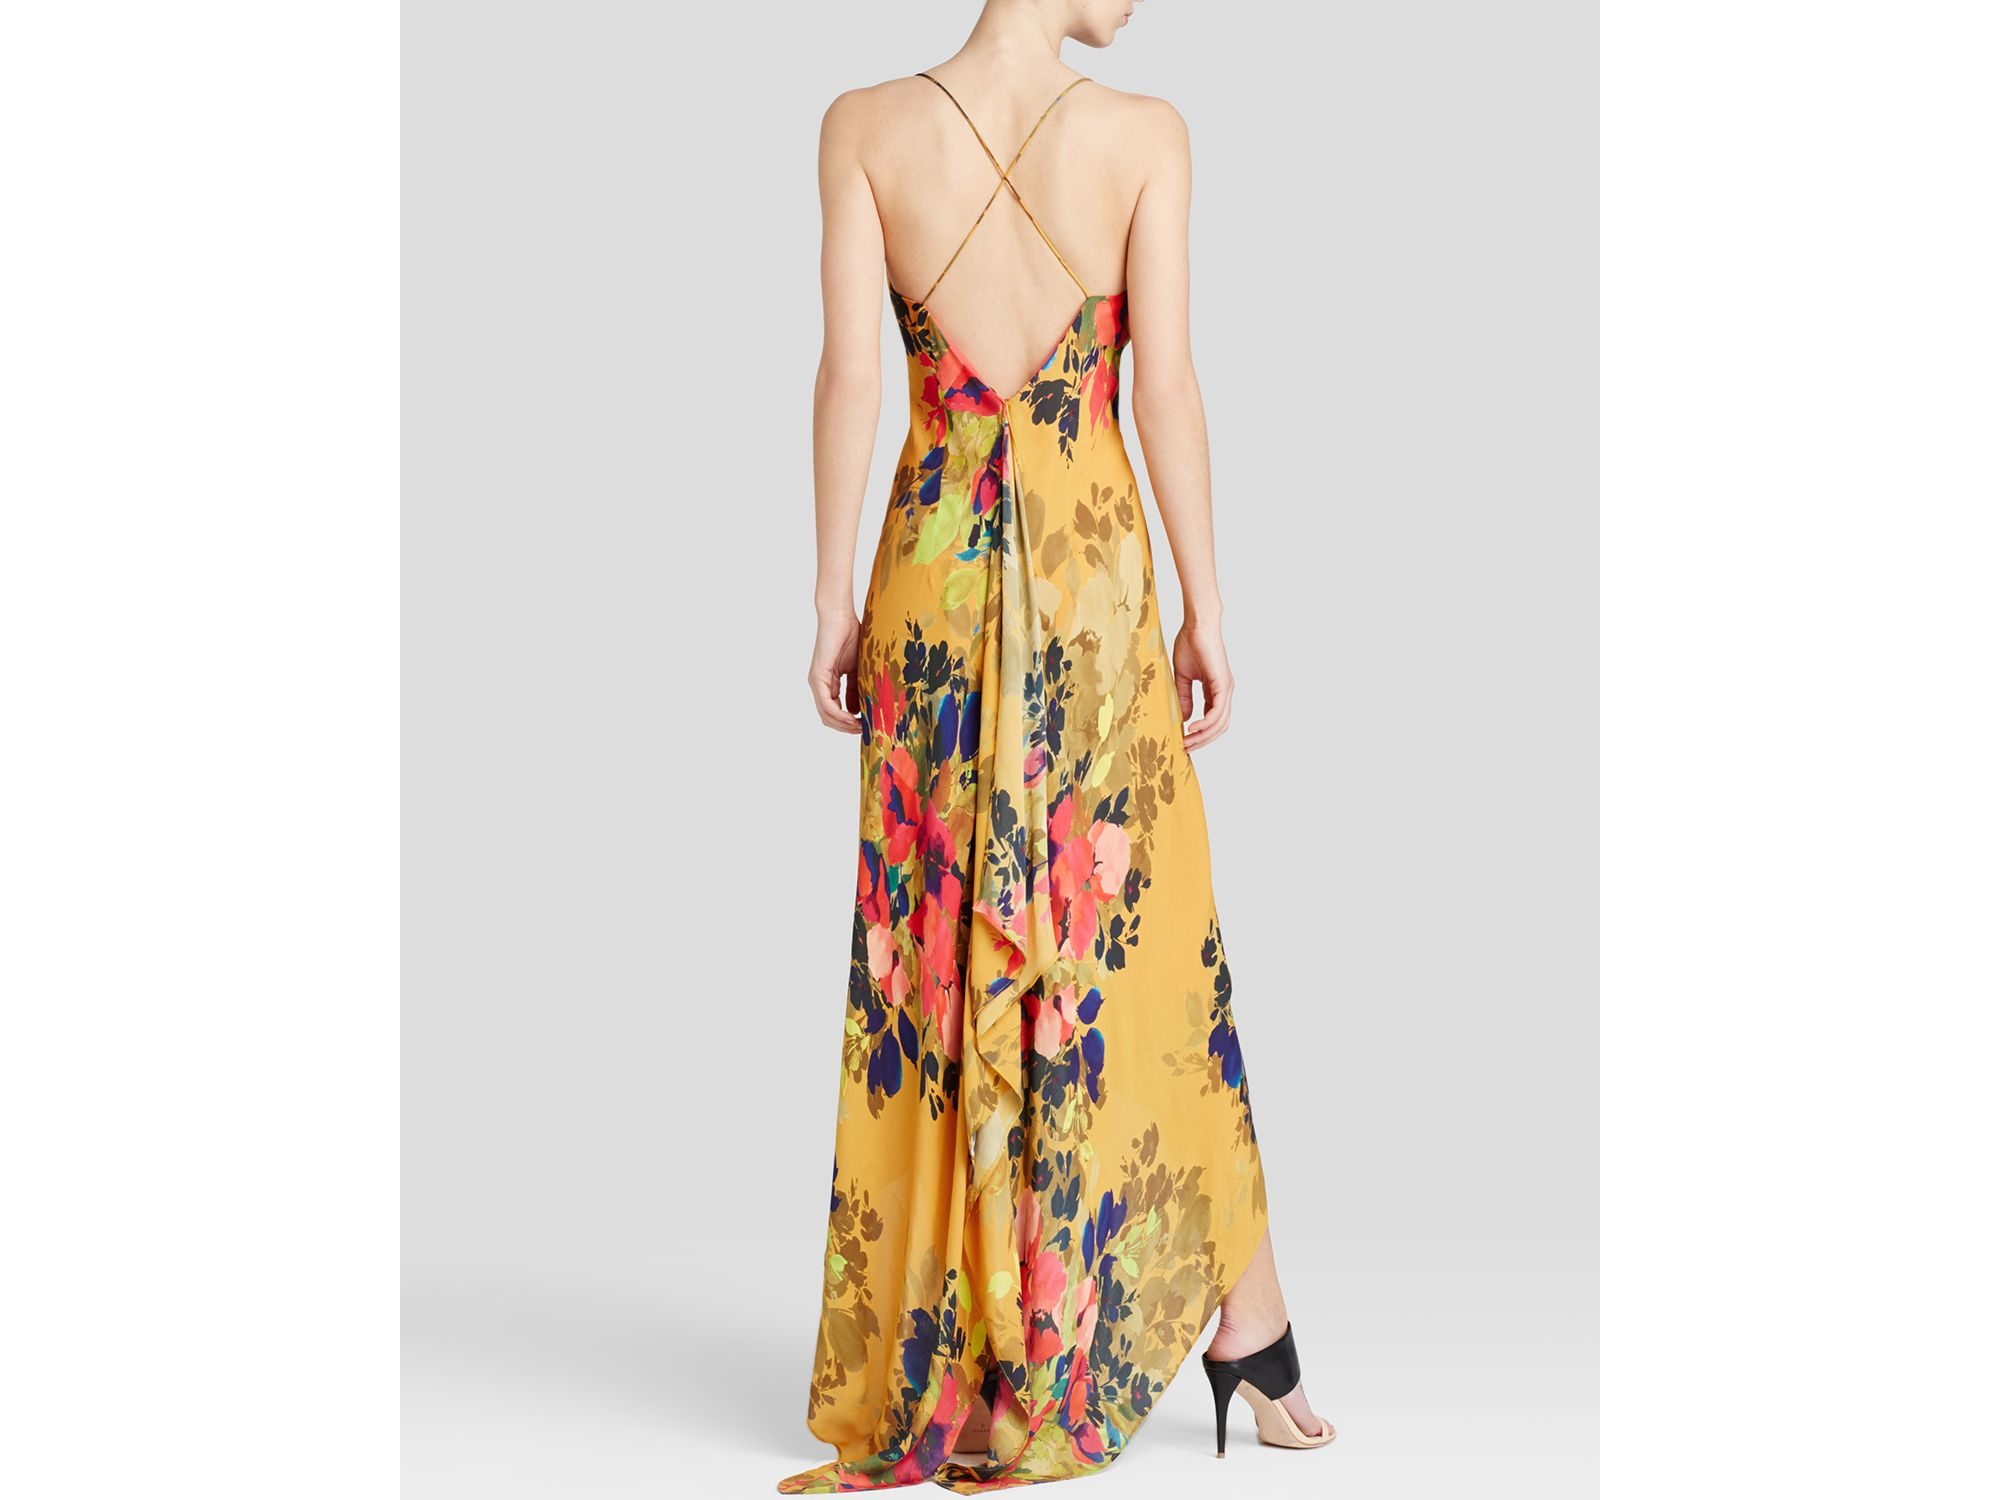 Nicole miller Maxi Dress - Angelina Satin Printed High/low Hem | Lyst